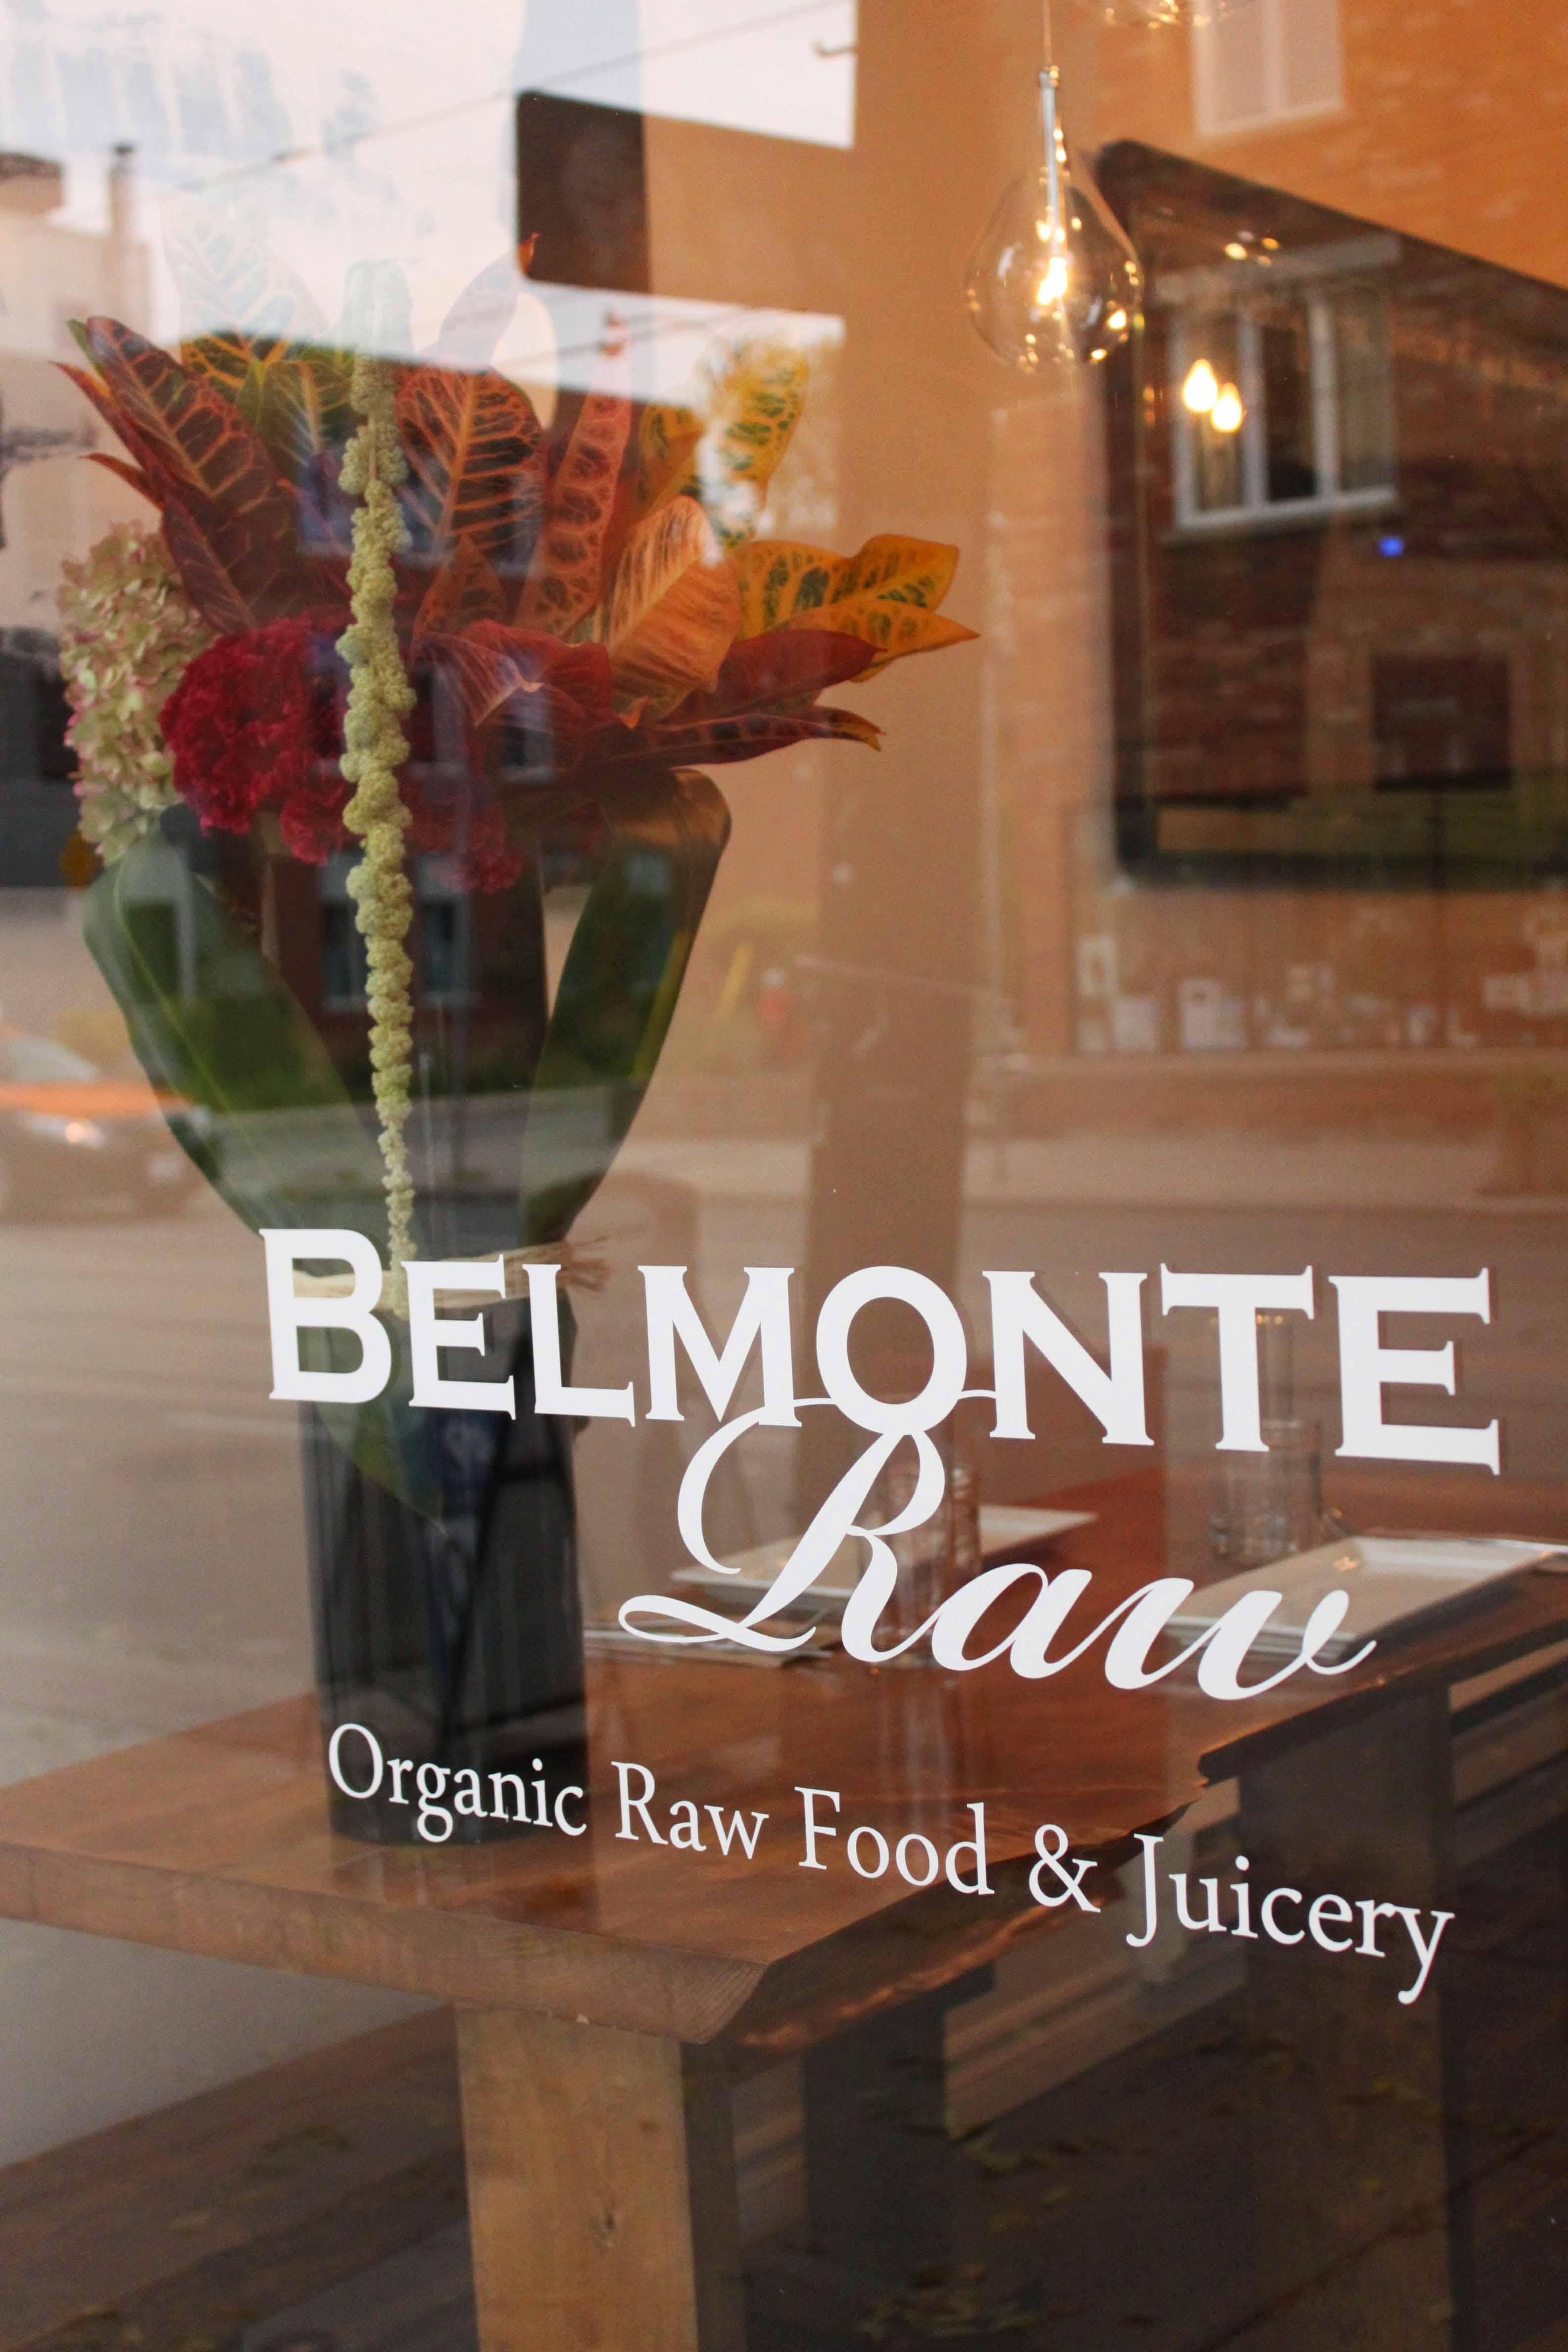 Belmonte Raw Restaurant Review